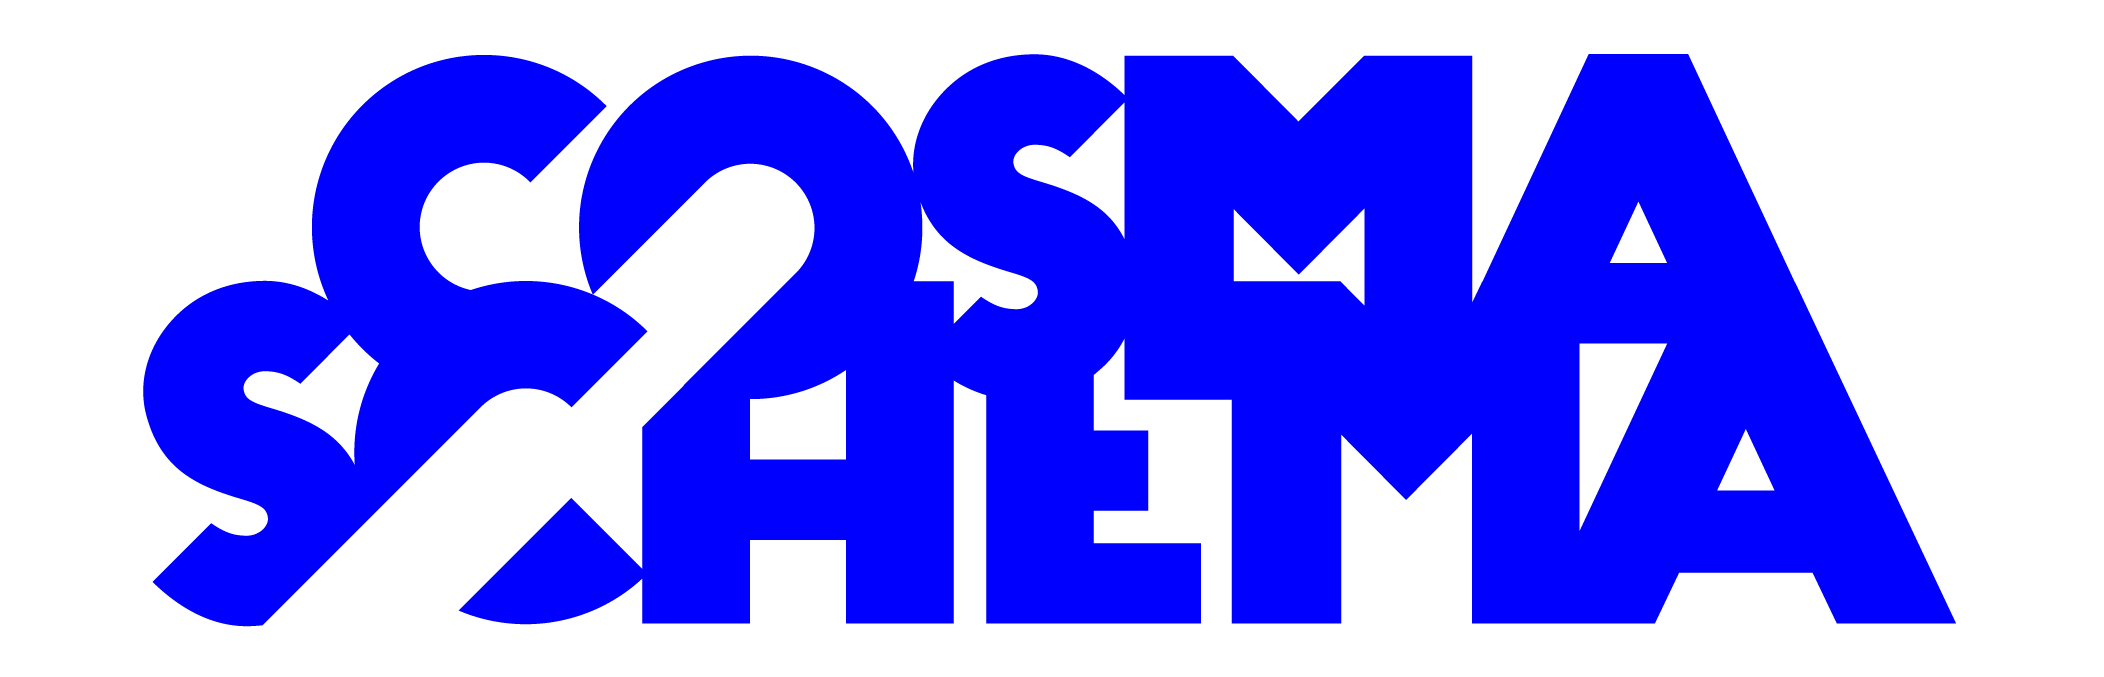 Cosma Schema